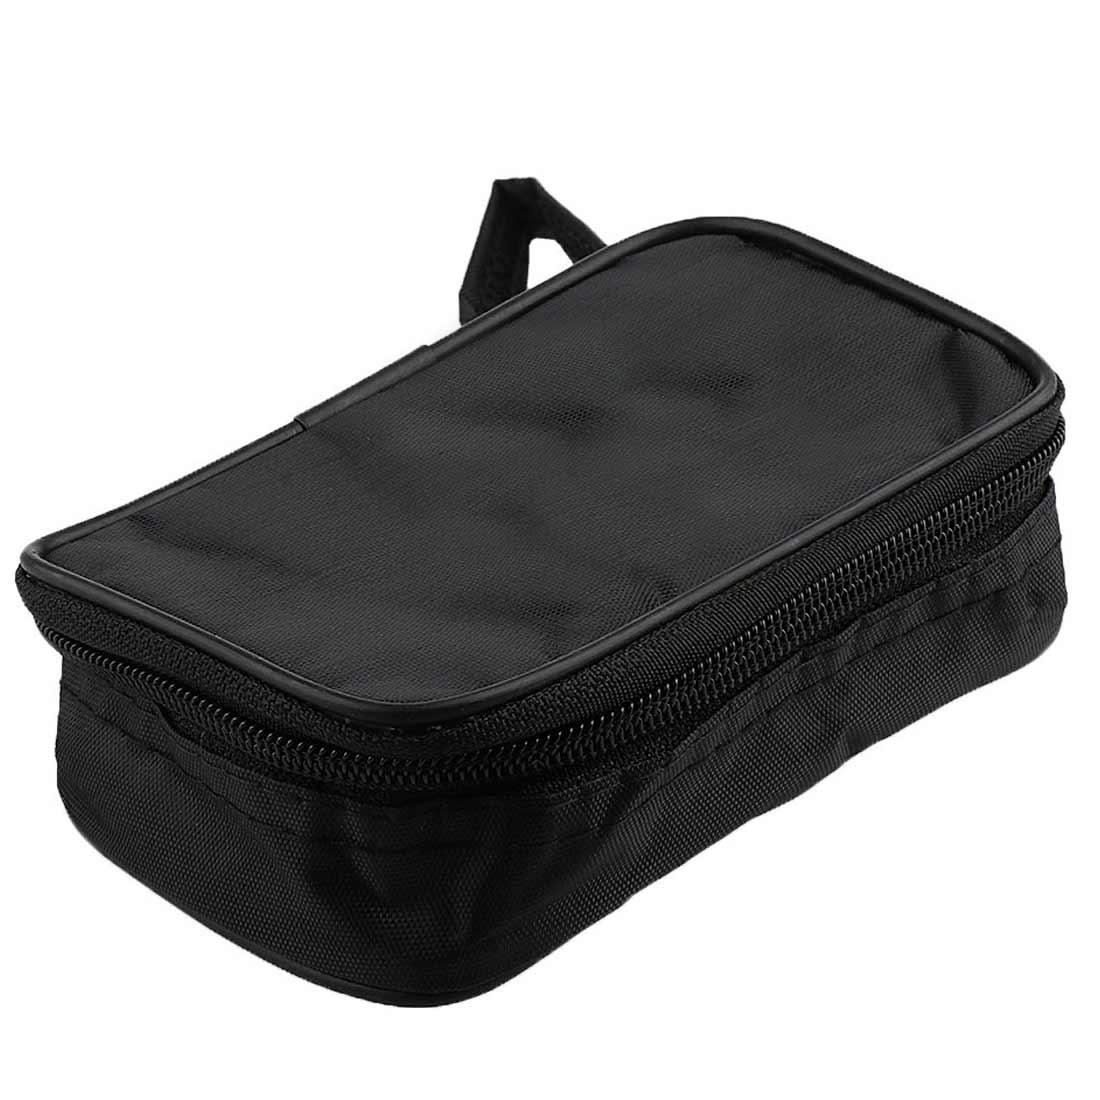 Waterproof Tools Bag Multimeter Black Canvas Bag For Series Digital Multimeter Cloth Durable 23*14*5cm